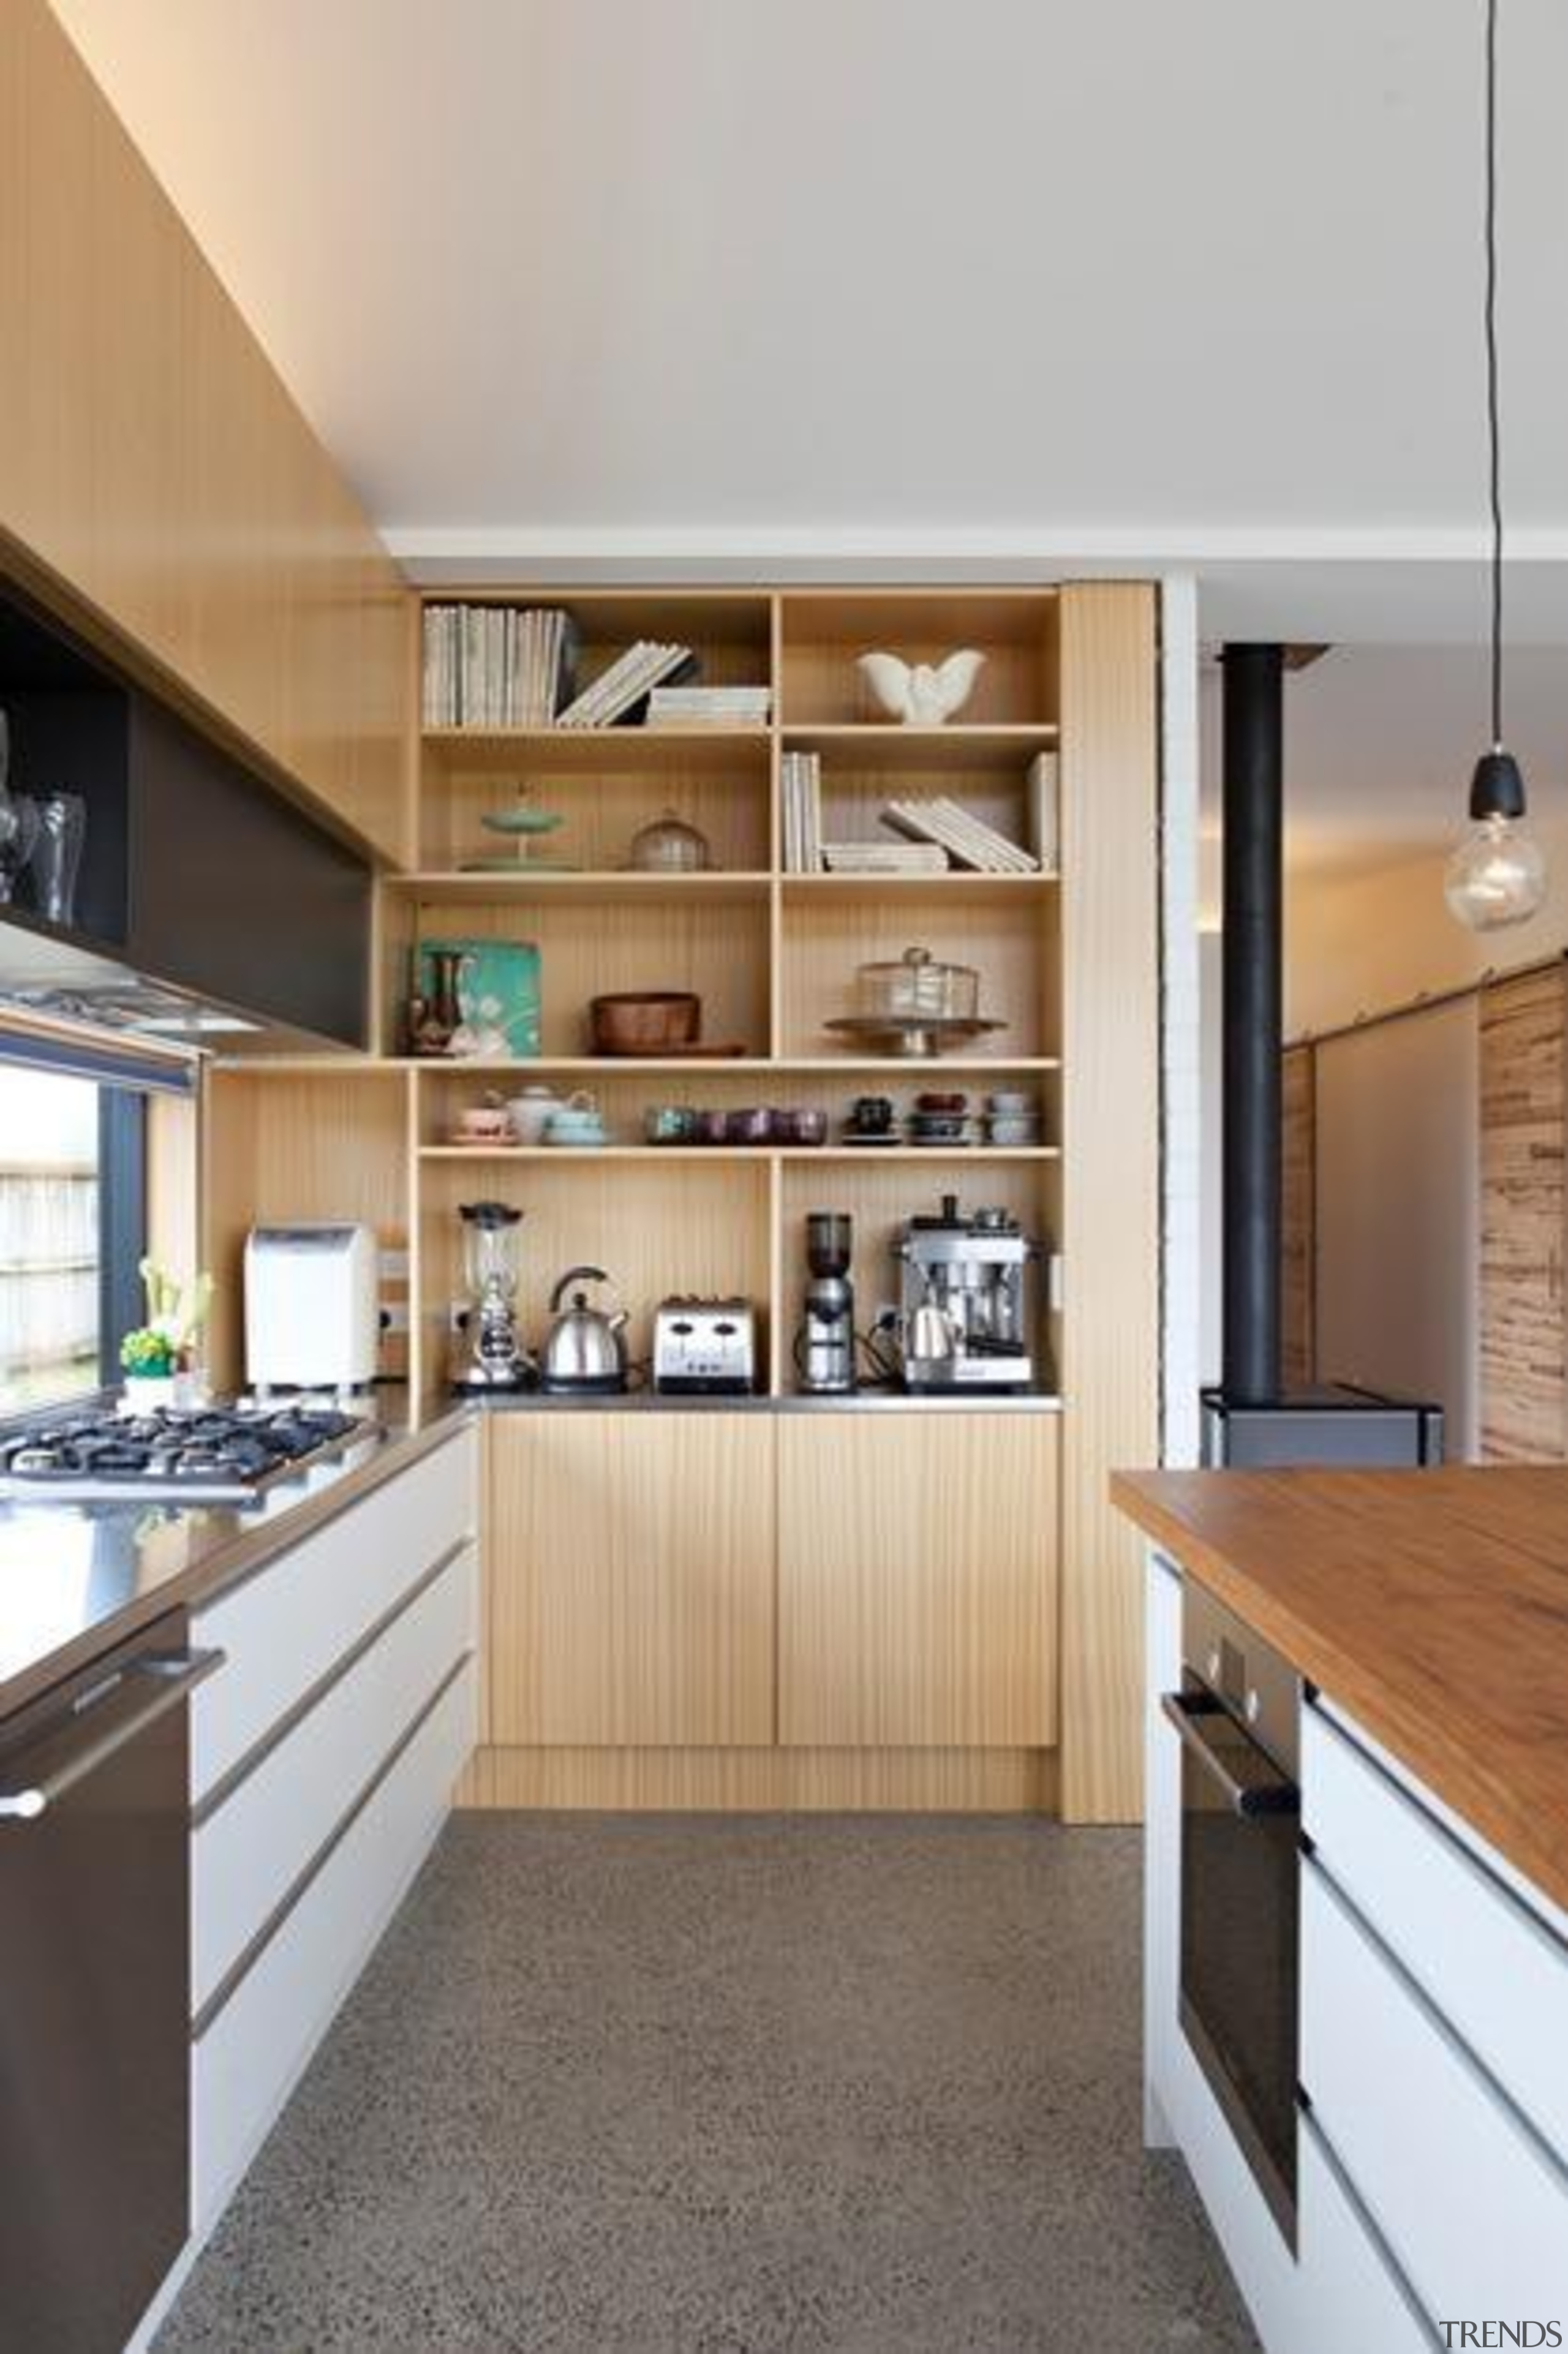 kitchen view - kitchen view - cabinetry | cabinetry, countertop, cuisine classique, interior design, kitchen, gray